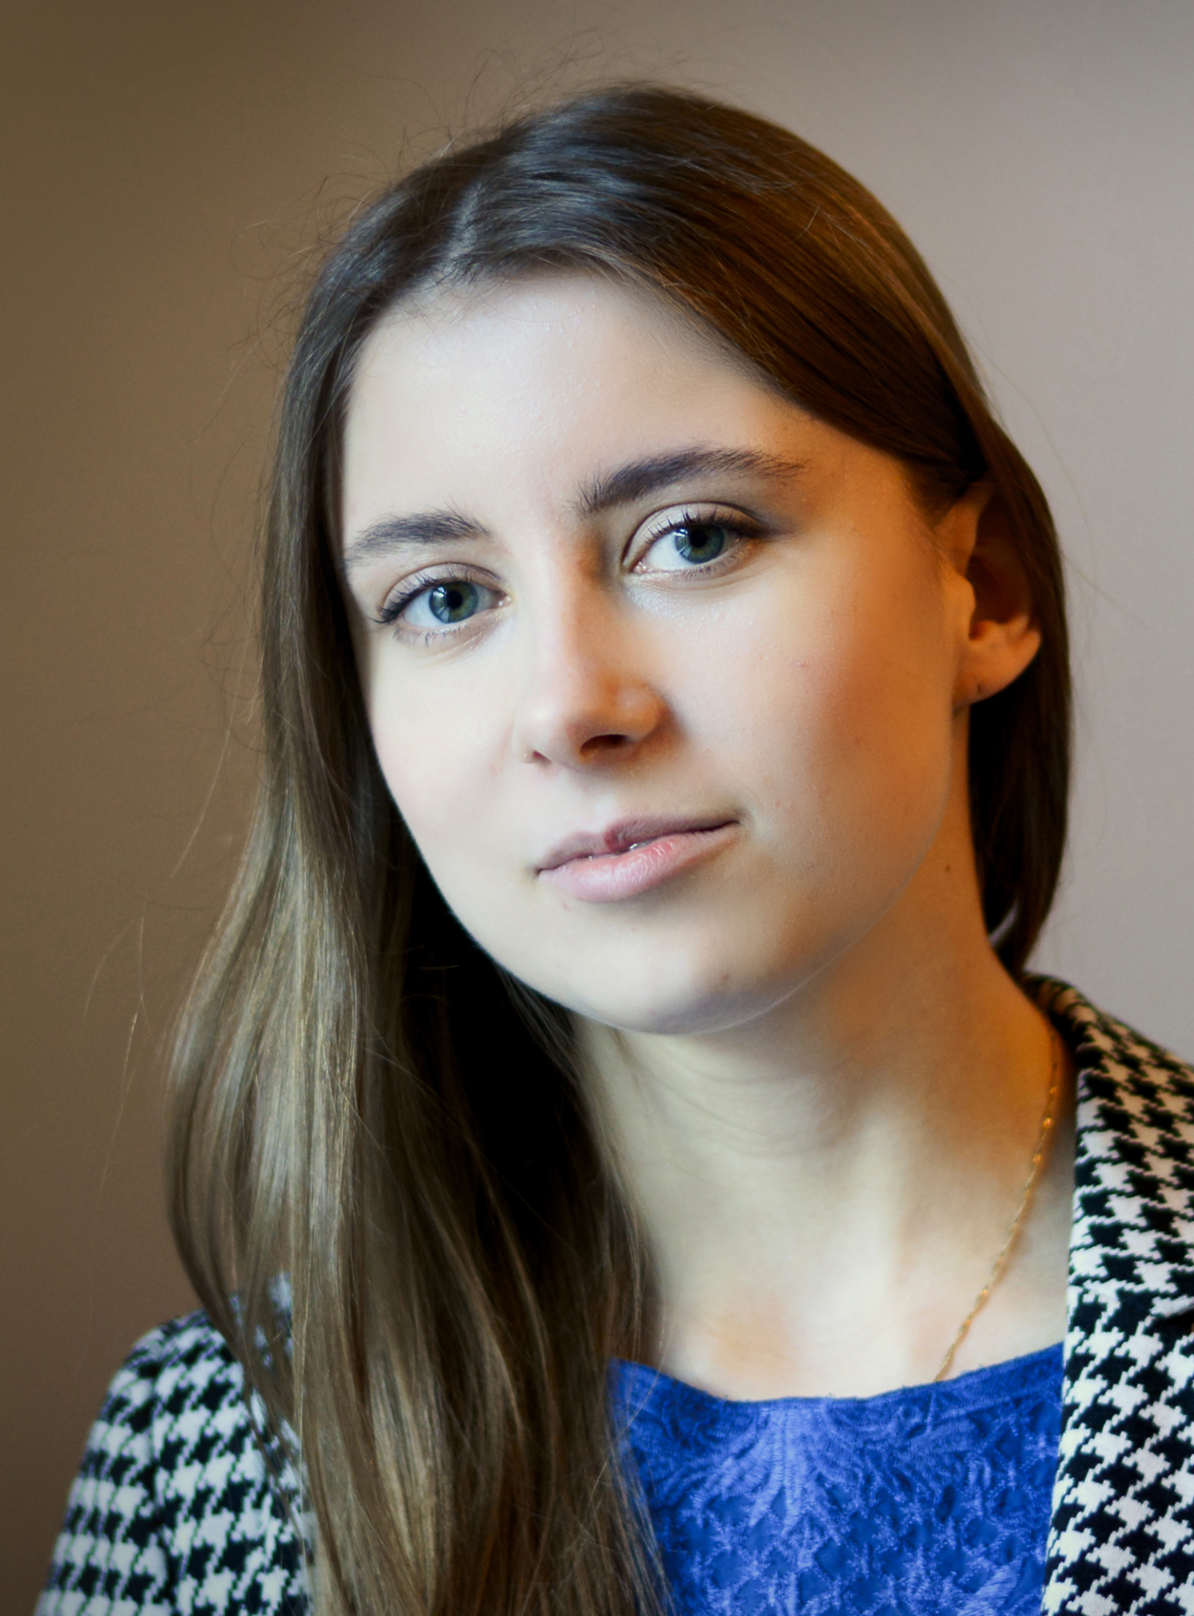 Natalia Kowalska - Asystent prawny - Kancelaria Adwokacka Ius Cogens Toruń